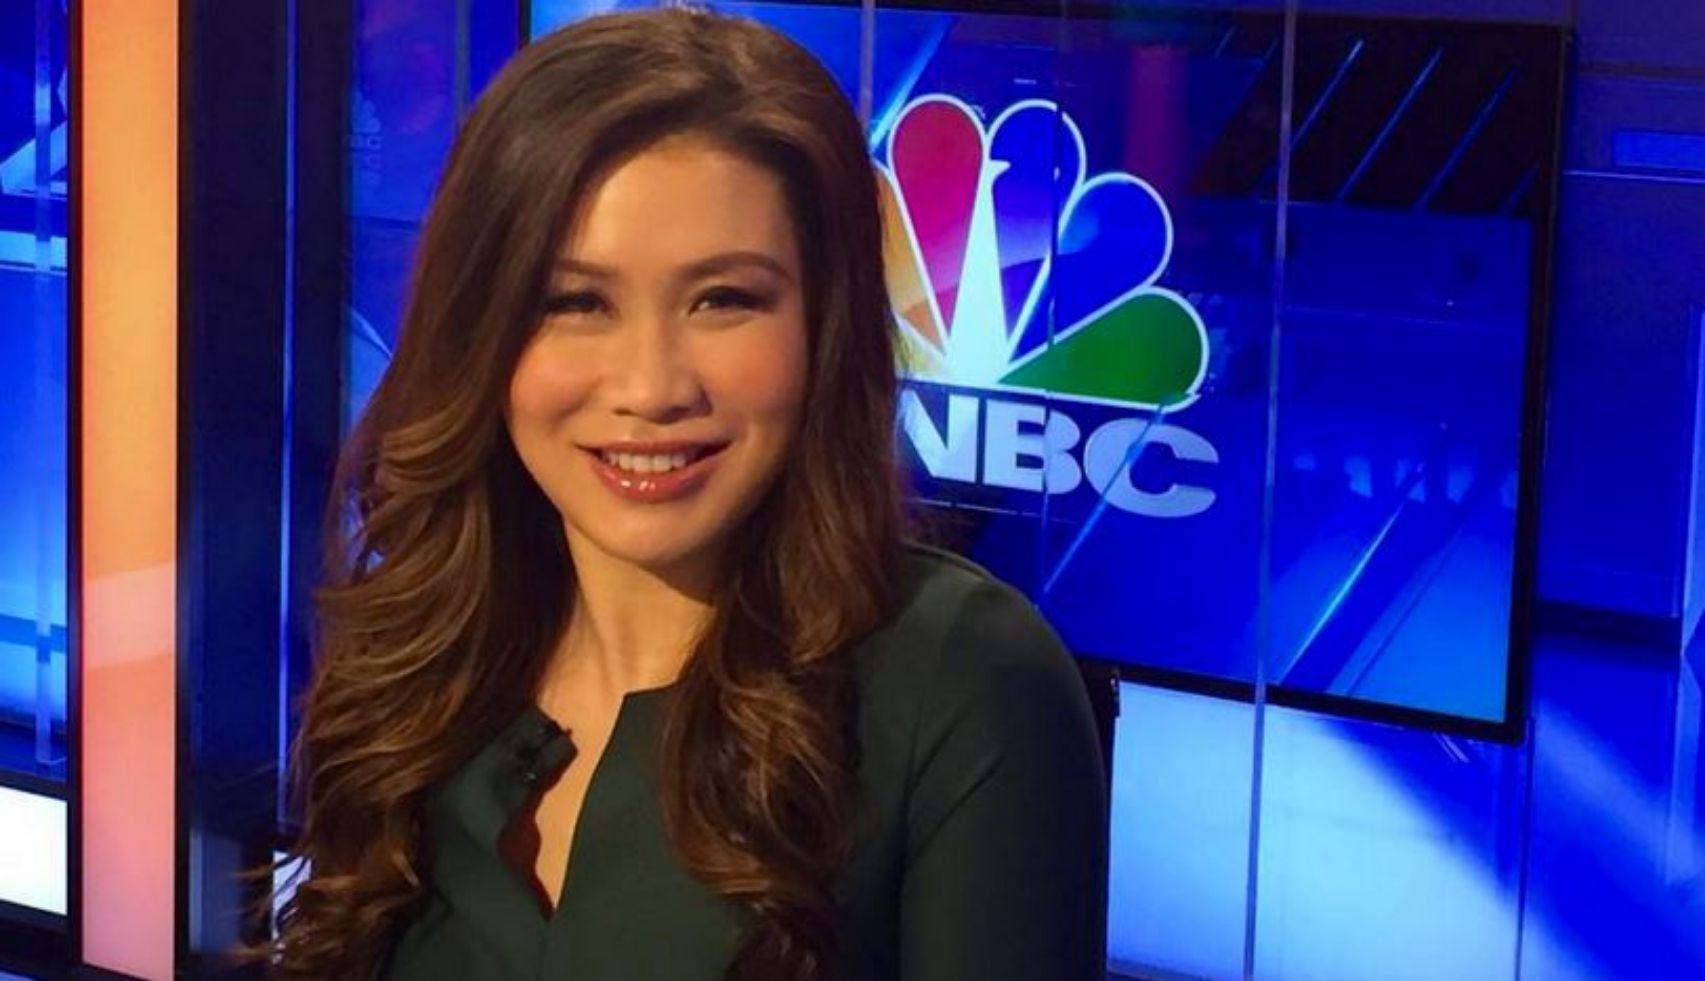 Susan Li's hottest female broadcaster